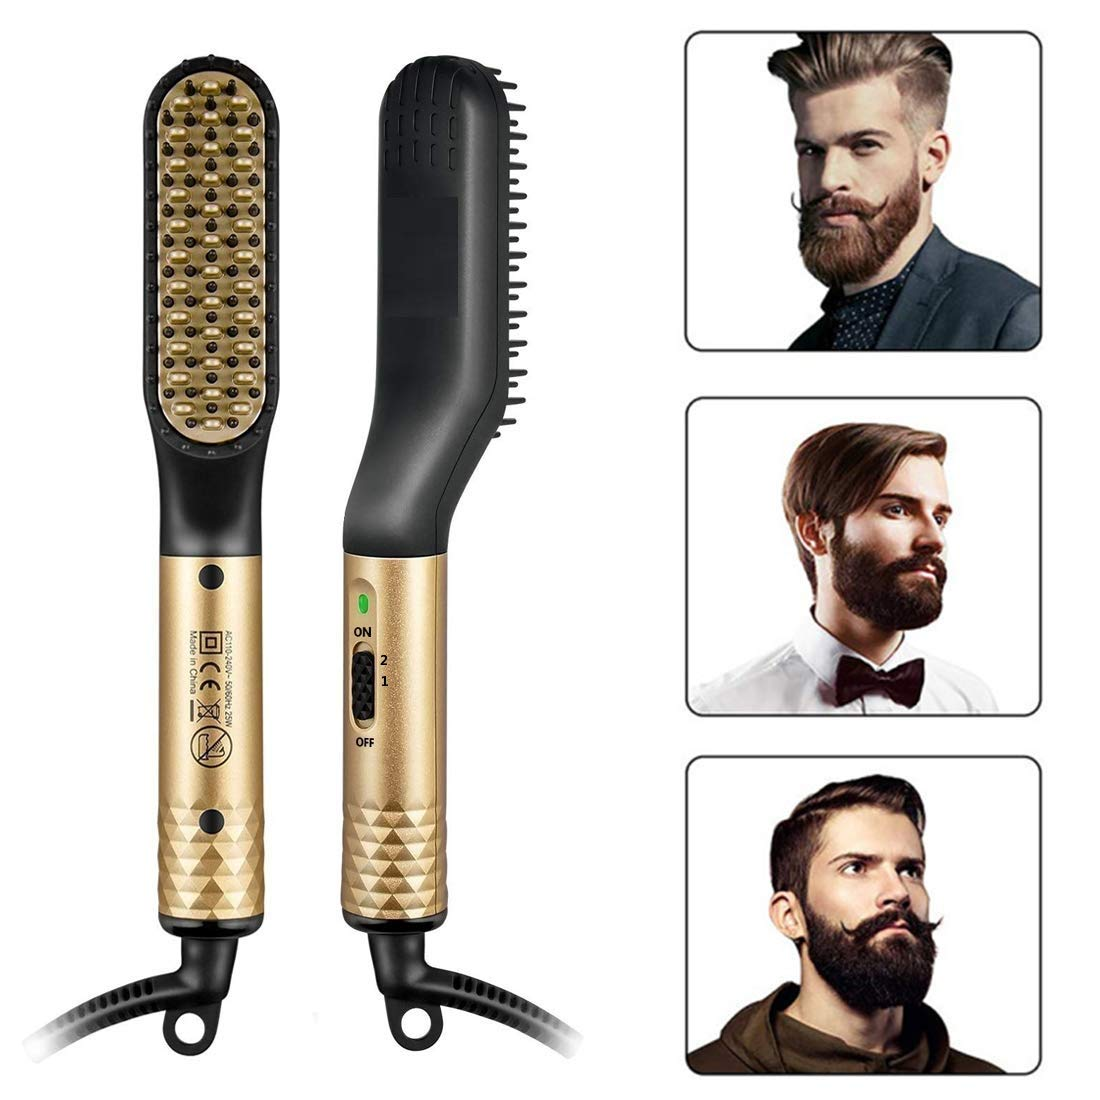 Rozia Beard Straightener Brush for Men -2 in 1 Portable Ionic Hair Straightening Brush